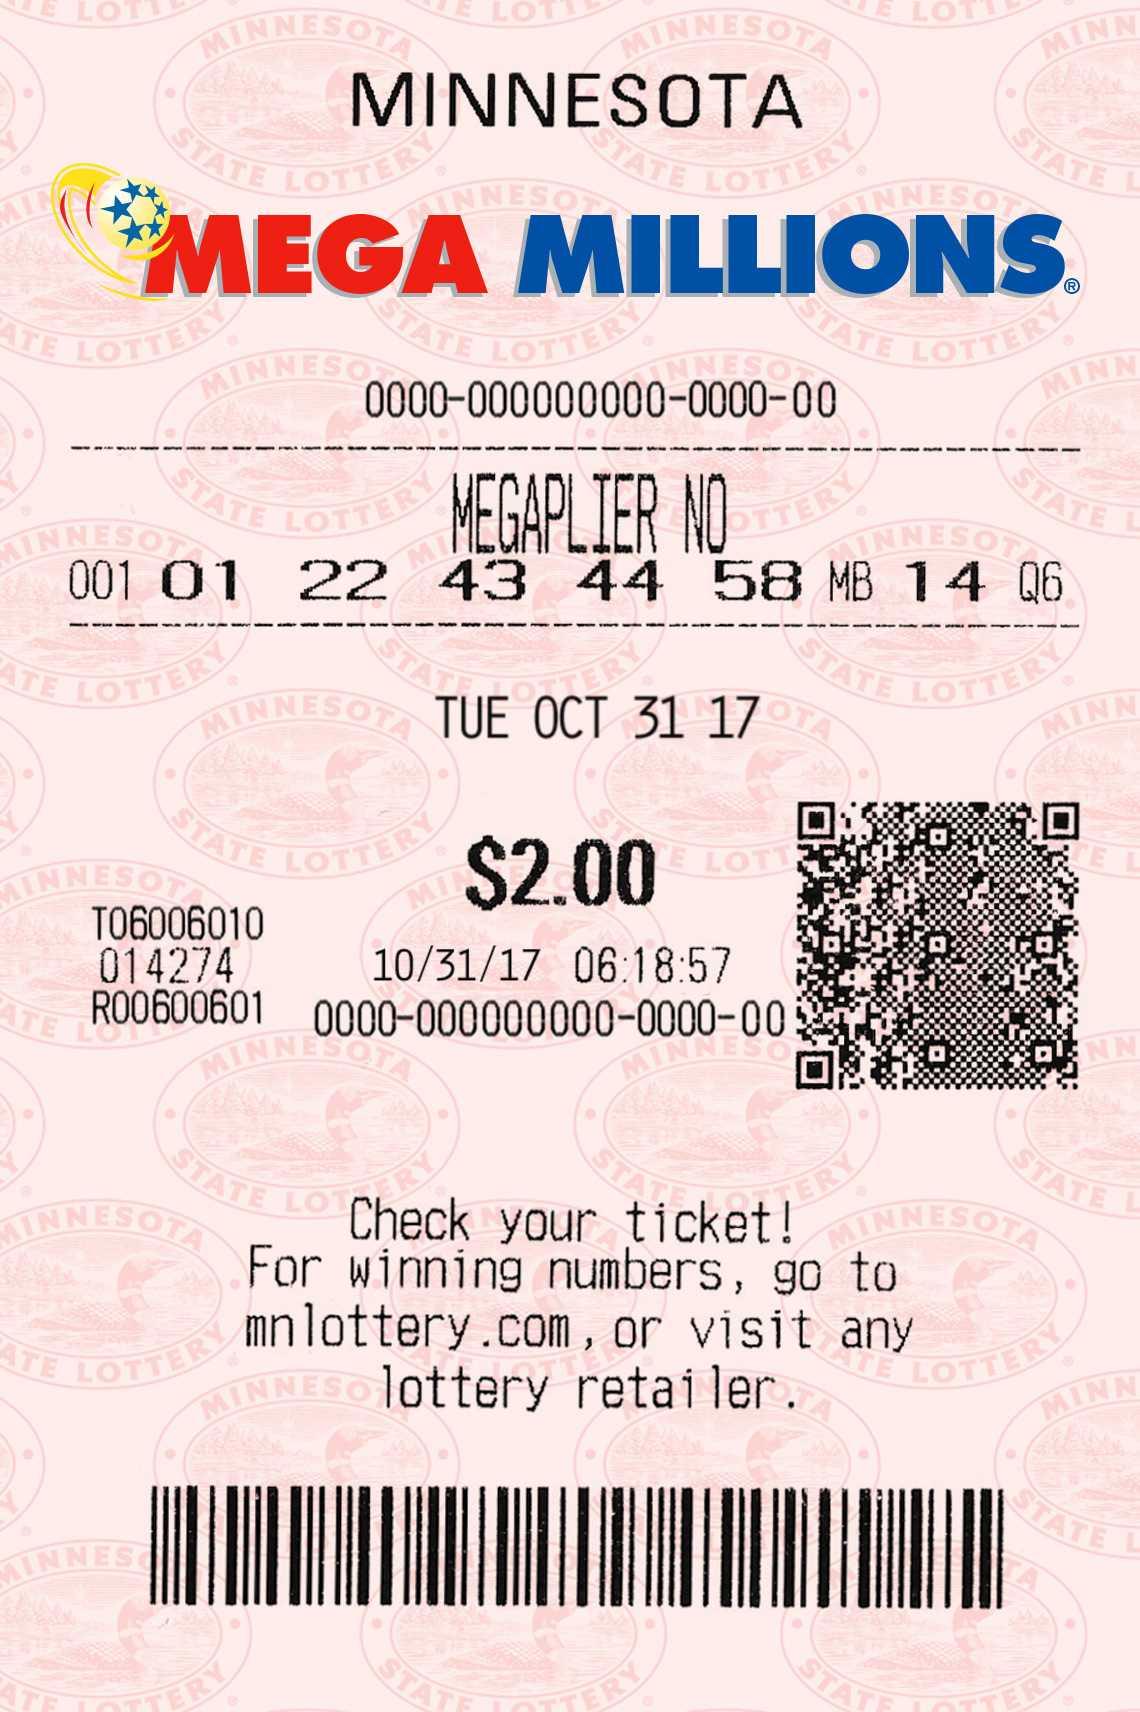 Jogue mega milhões | lottomania